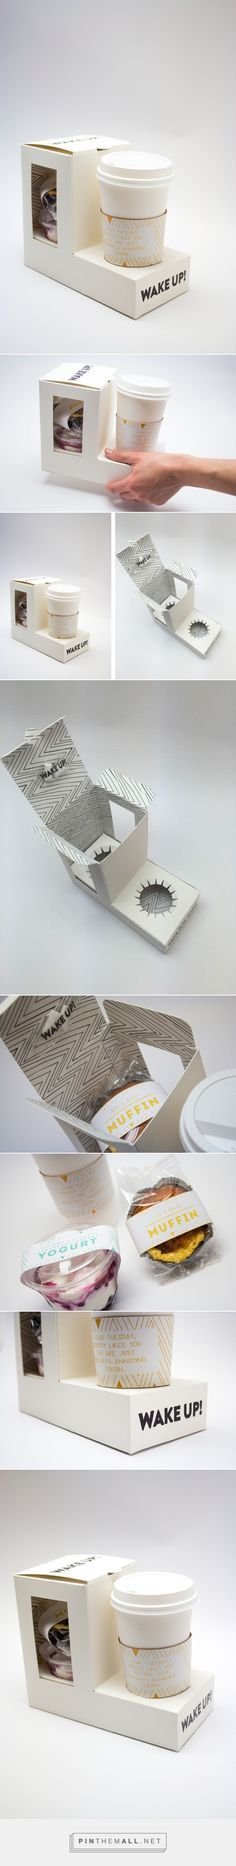 Idea de packaging en cajas para una empresa de café. Si estás interesado. https://www.cajadecarton.es/contactar?utm_source=Pinterestutm_medium=socialutm_campaign=20160617-cajadecarton_contactar